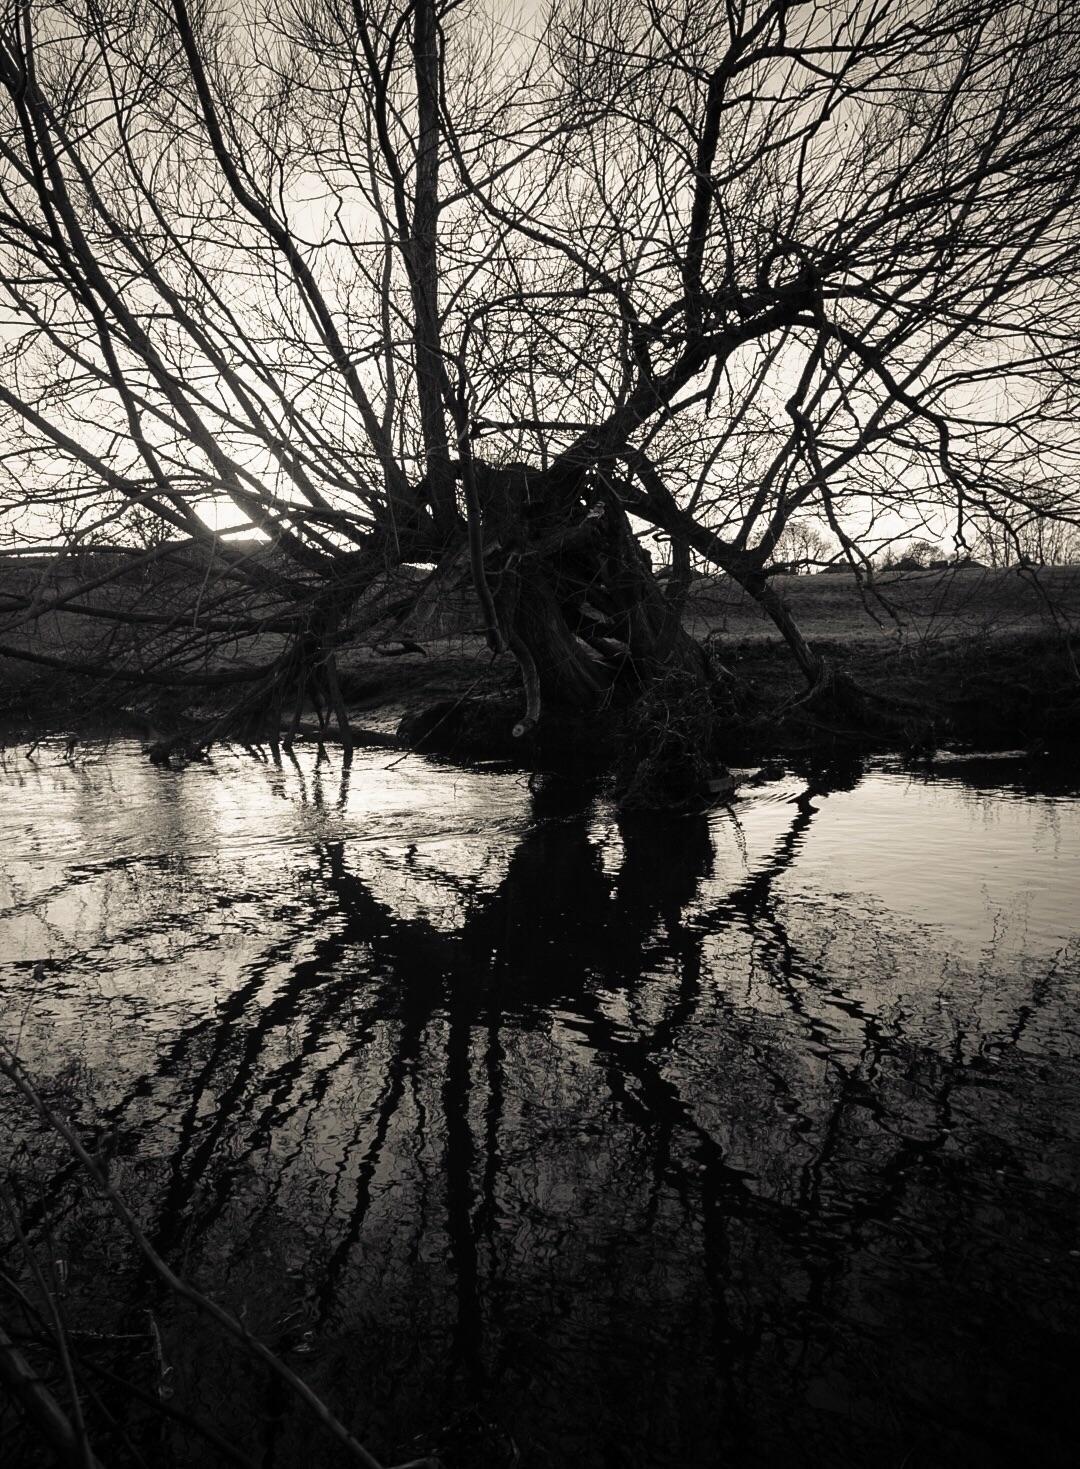 Rorschach river. 7th Jan 2018 - greyswan | ello